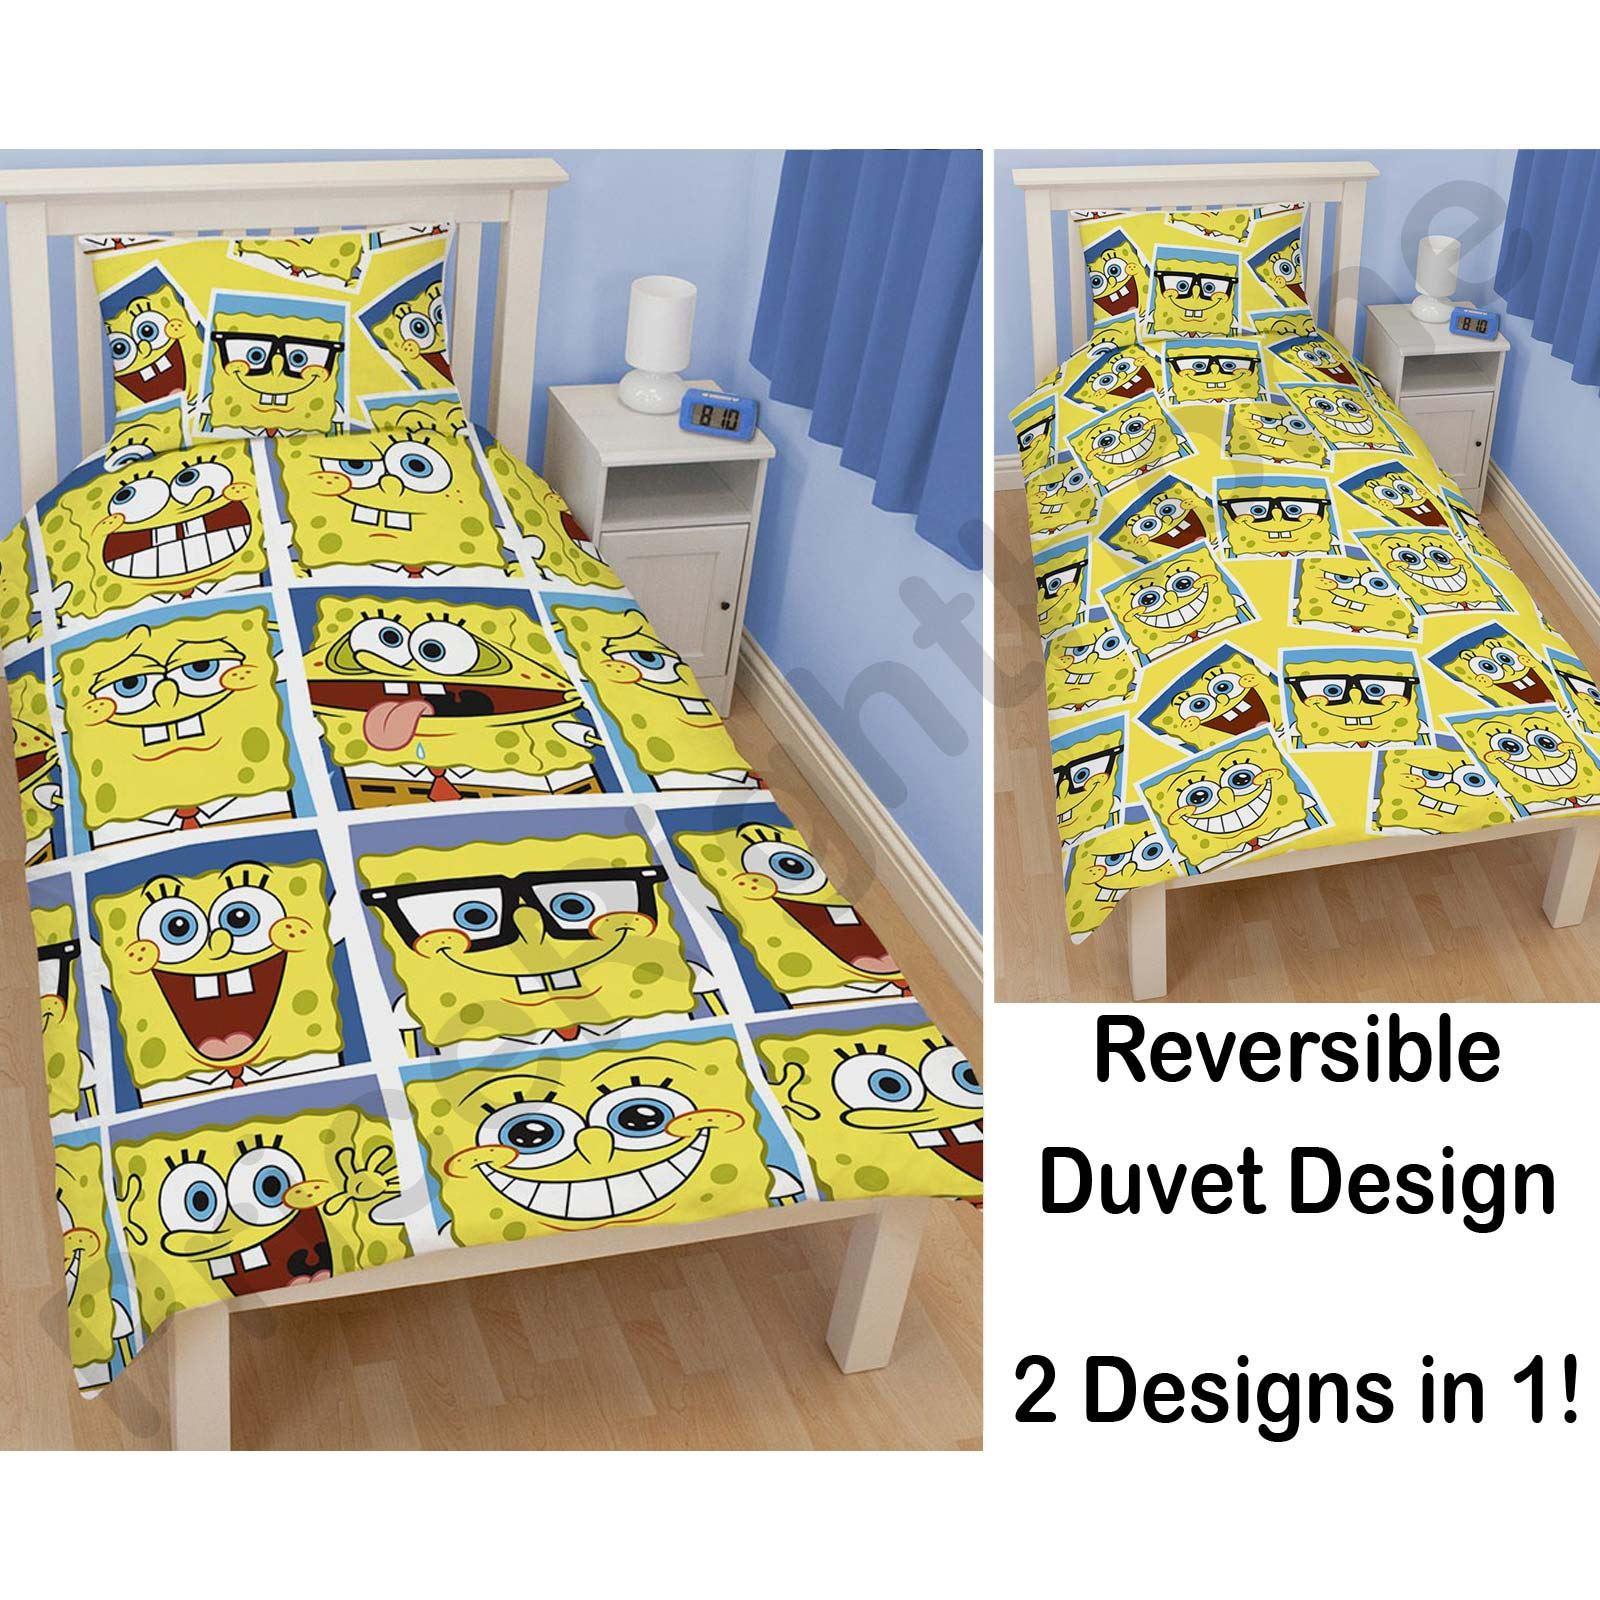 spongebob squarepants bedroom accessories bedding furniture new